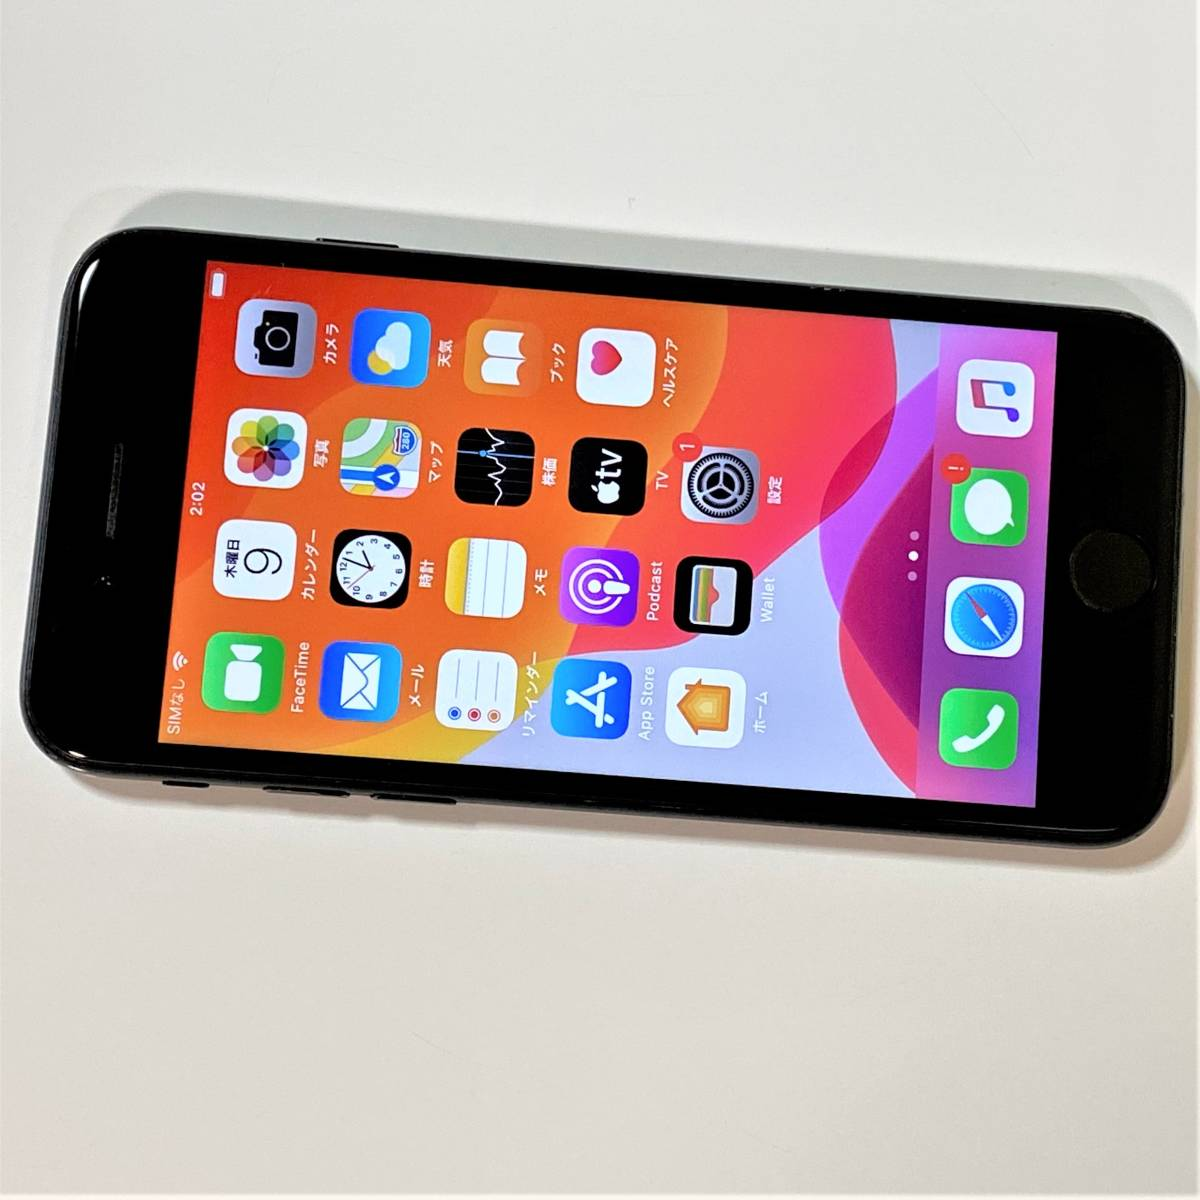 SIMフリー iPhone 7 ジェットブラック 128GB NNCP2J/A iOS13.5.1 docomo 格安SIM MVNO 海外利用可能 アクティベーションロック解除済